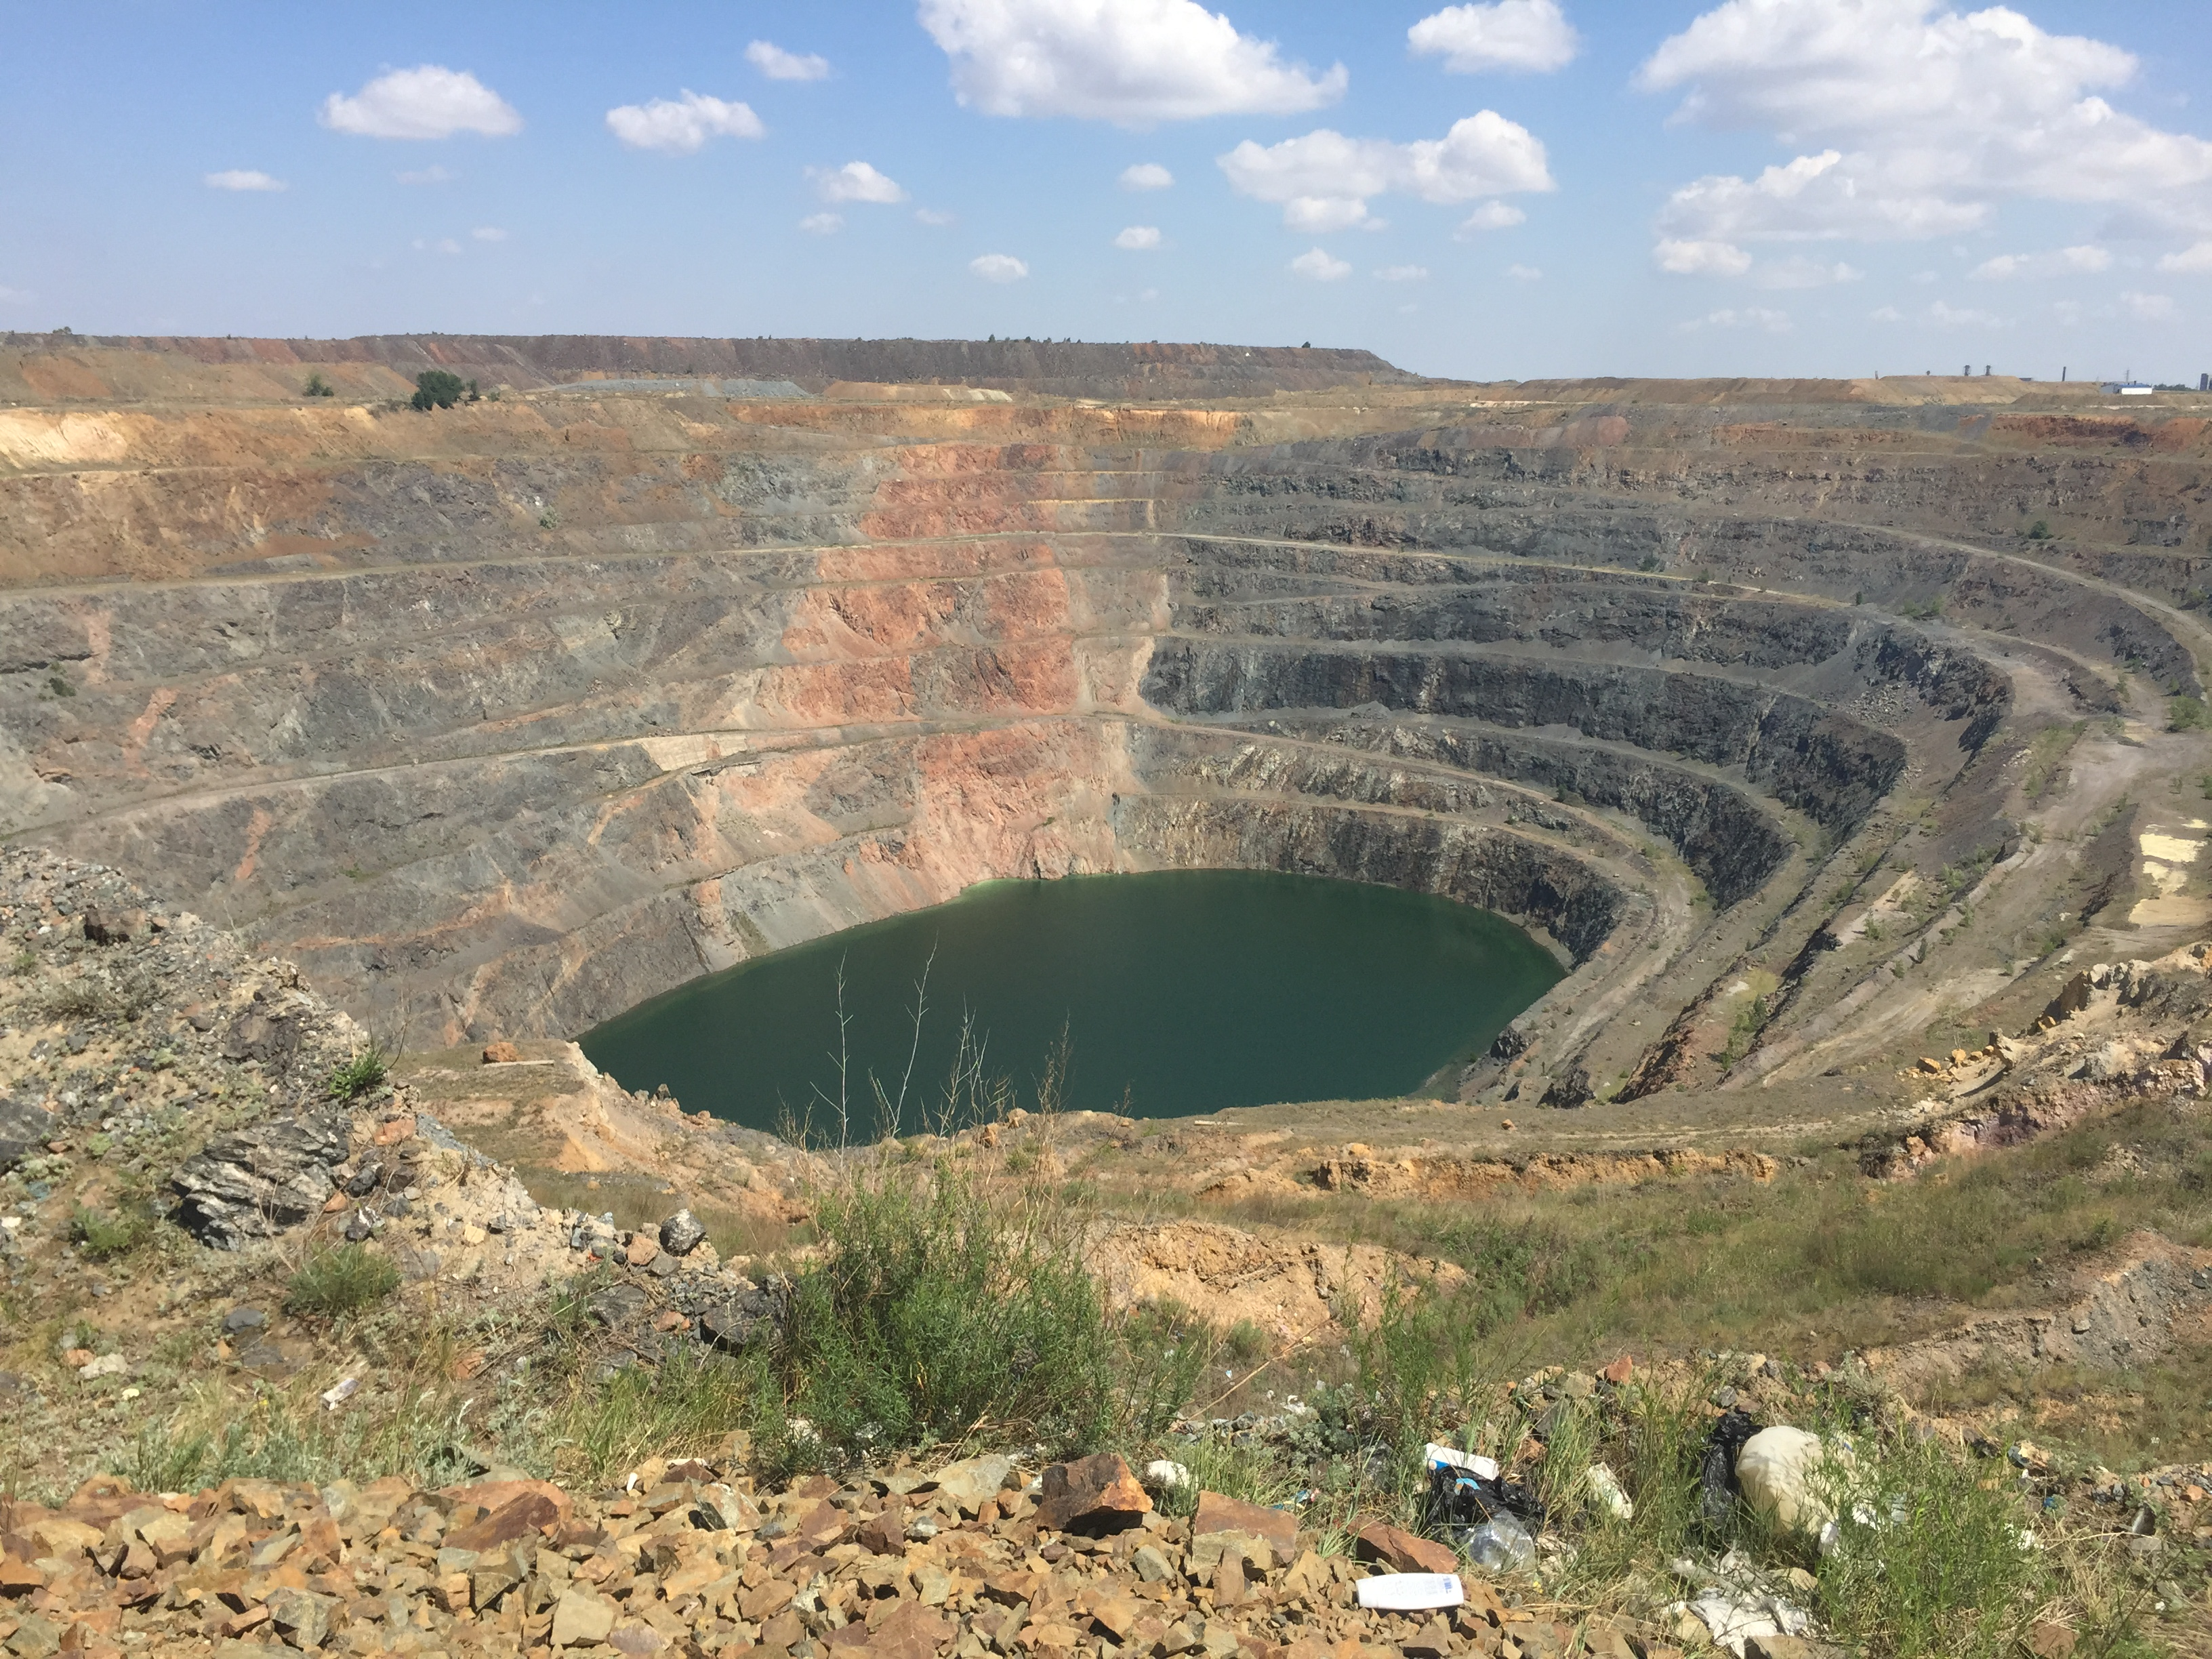 Uranium tailings pond